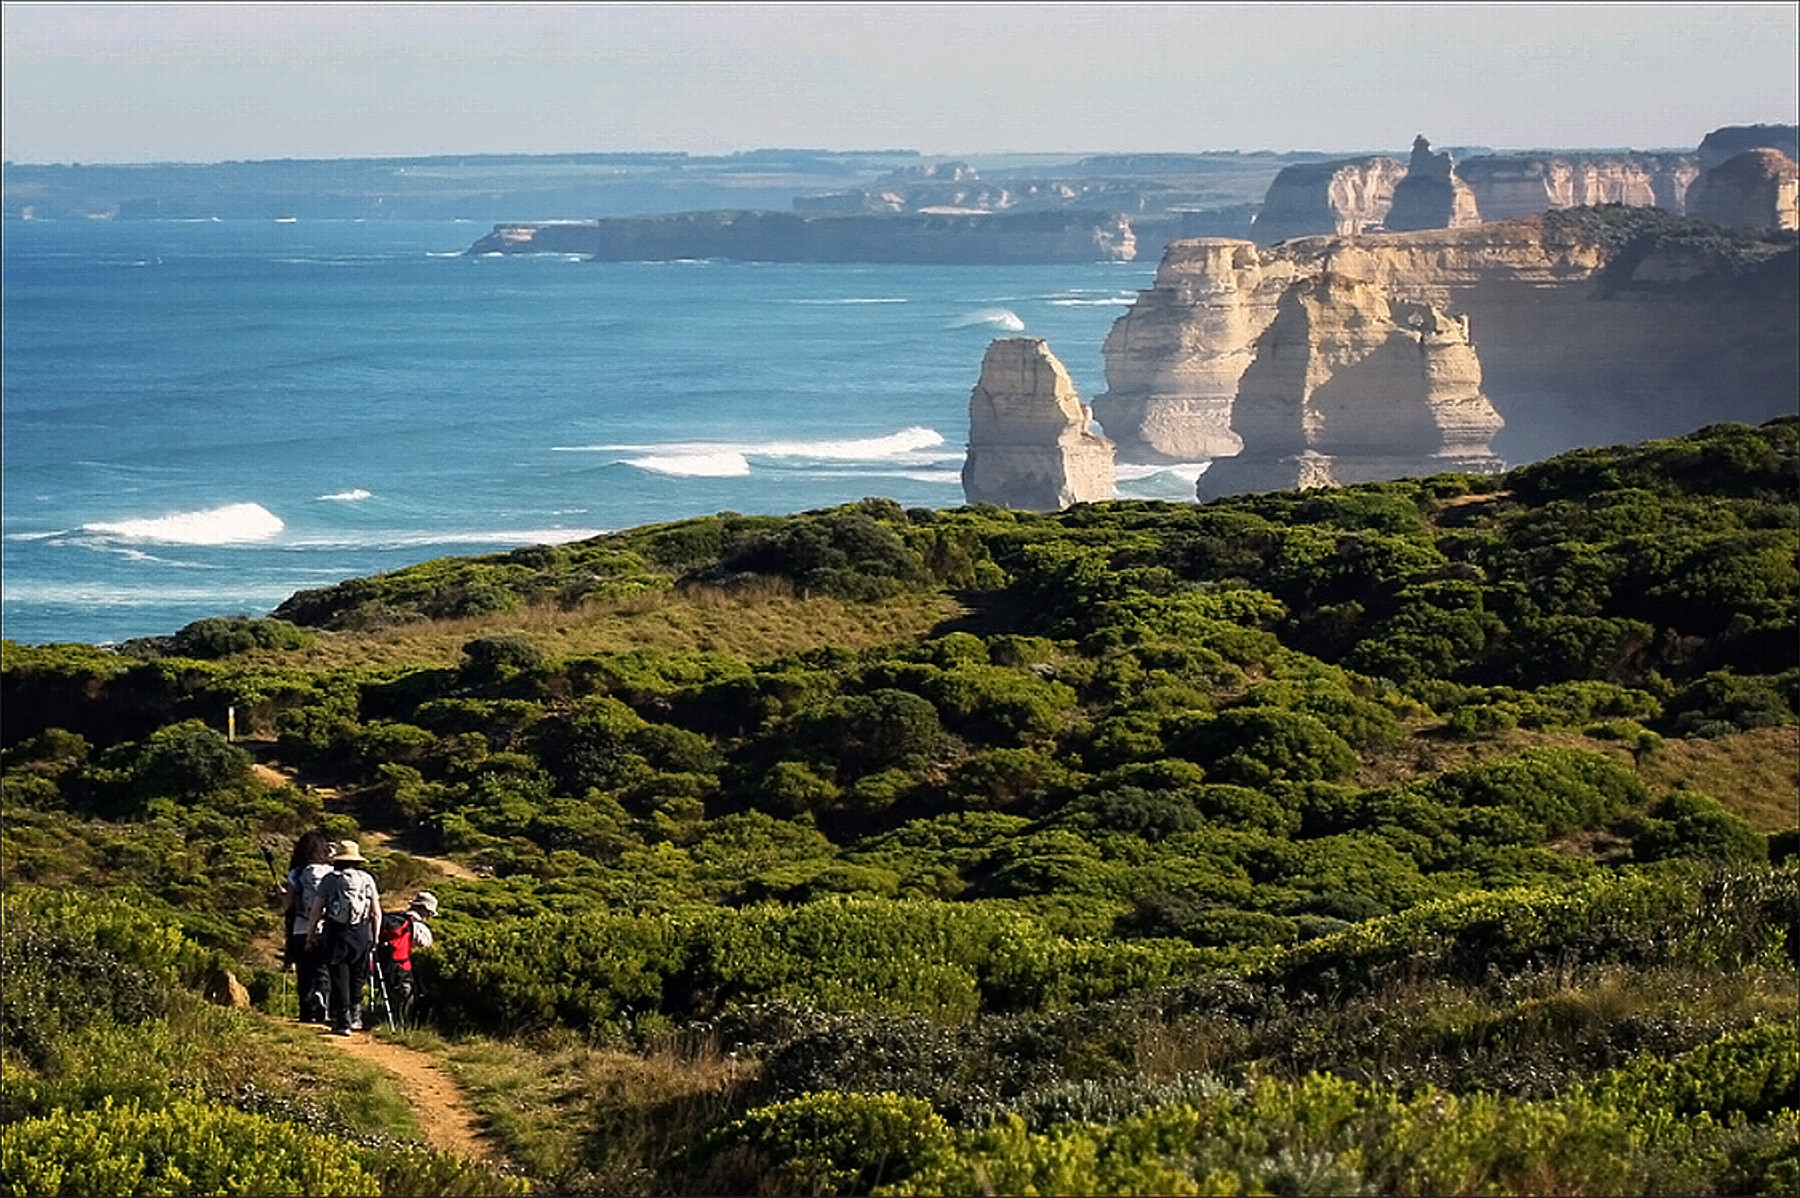 Bothfeet Great Walks of Australia - 7 rotas de trekking ao redor do mundo que vão te surpreender